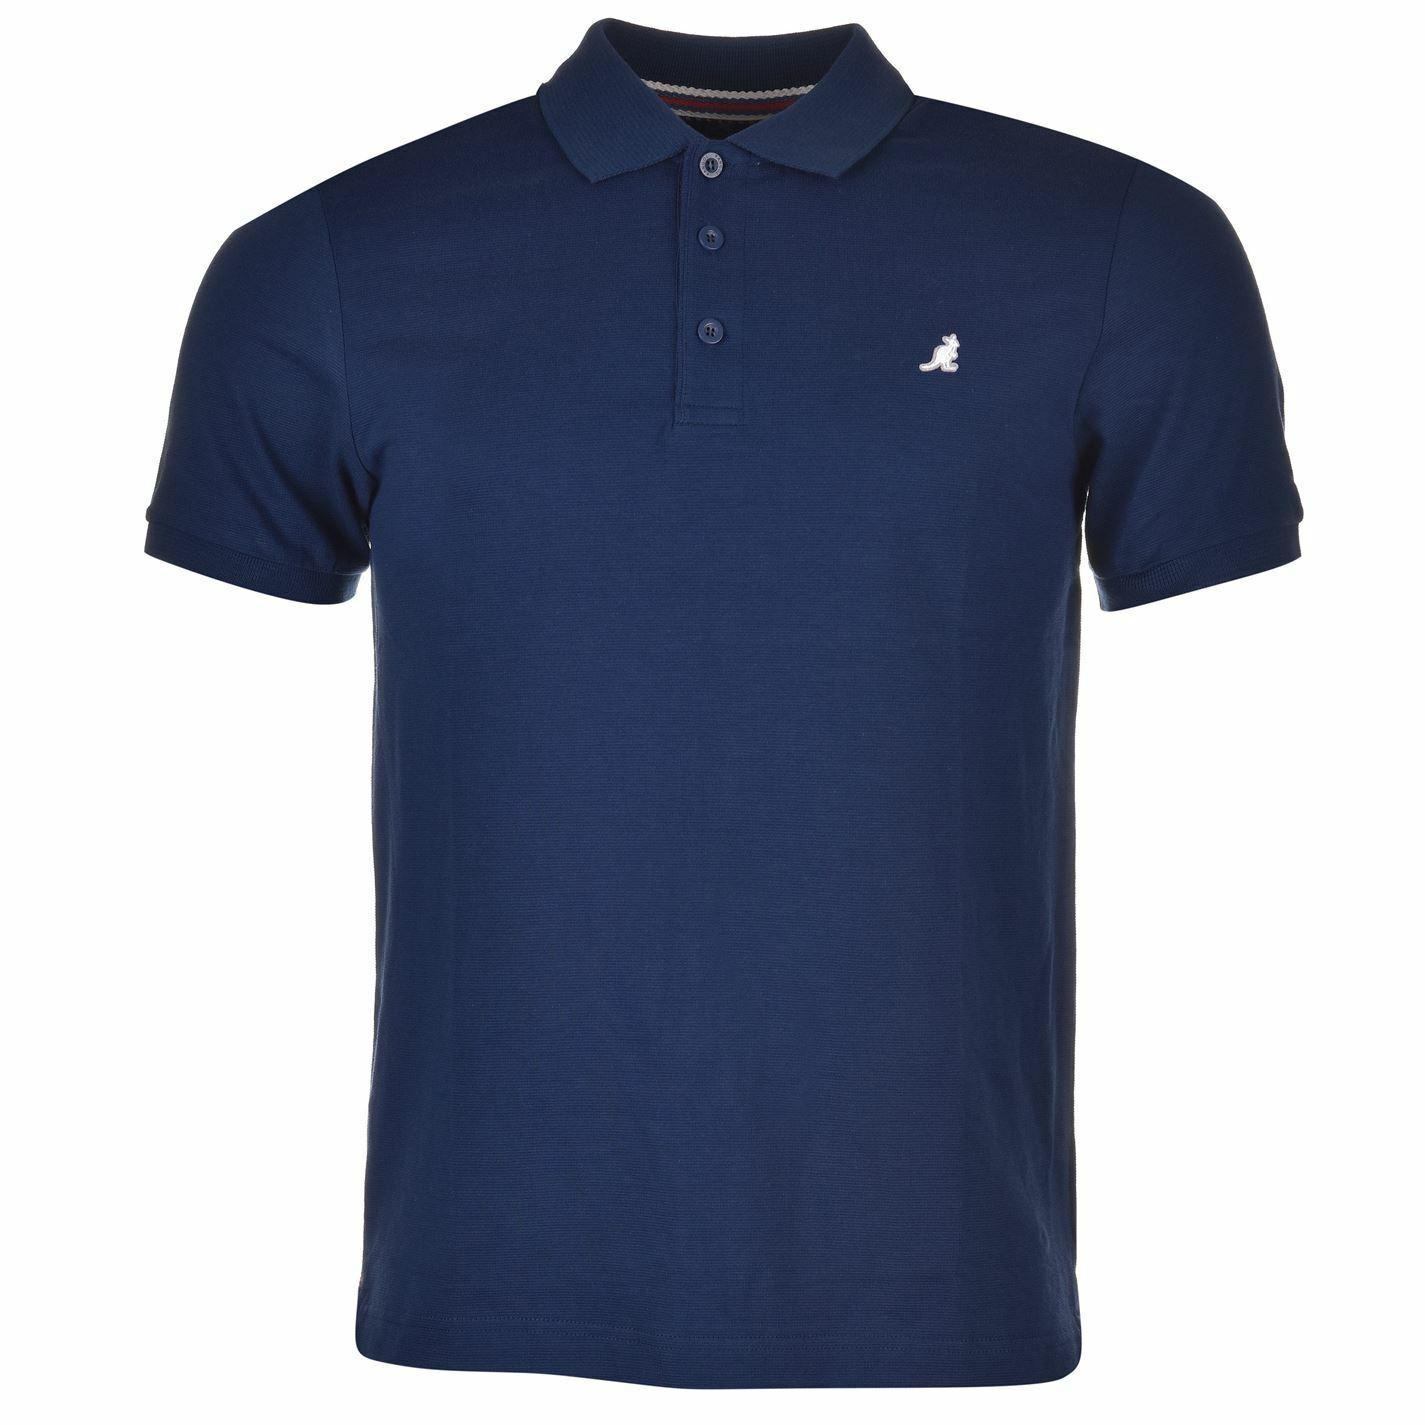 Kangol Brit Fit Polo Shirt Mens Navy Collared T-Shirt Top Tee